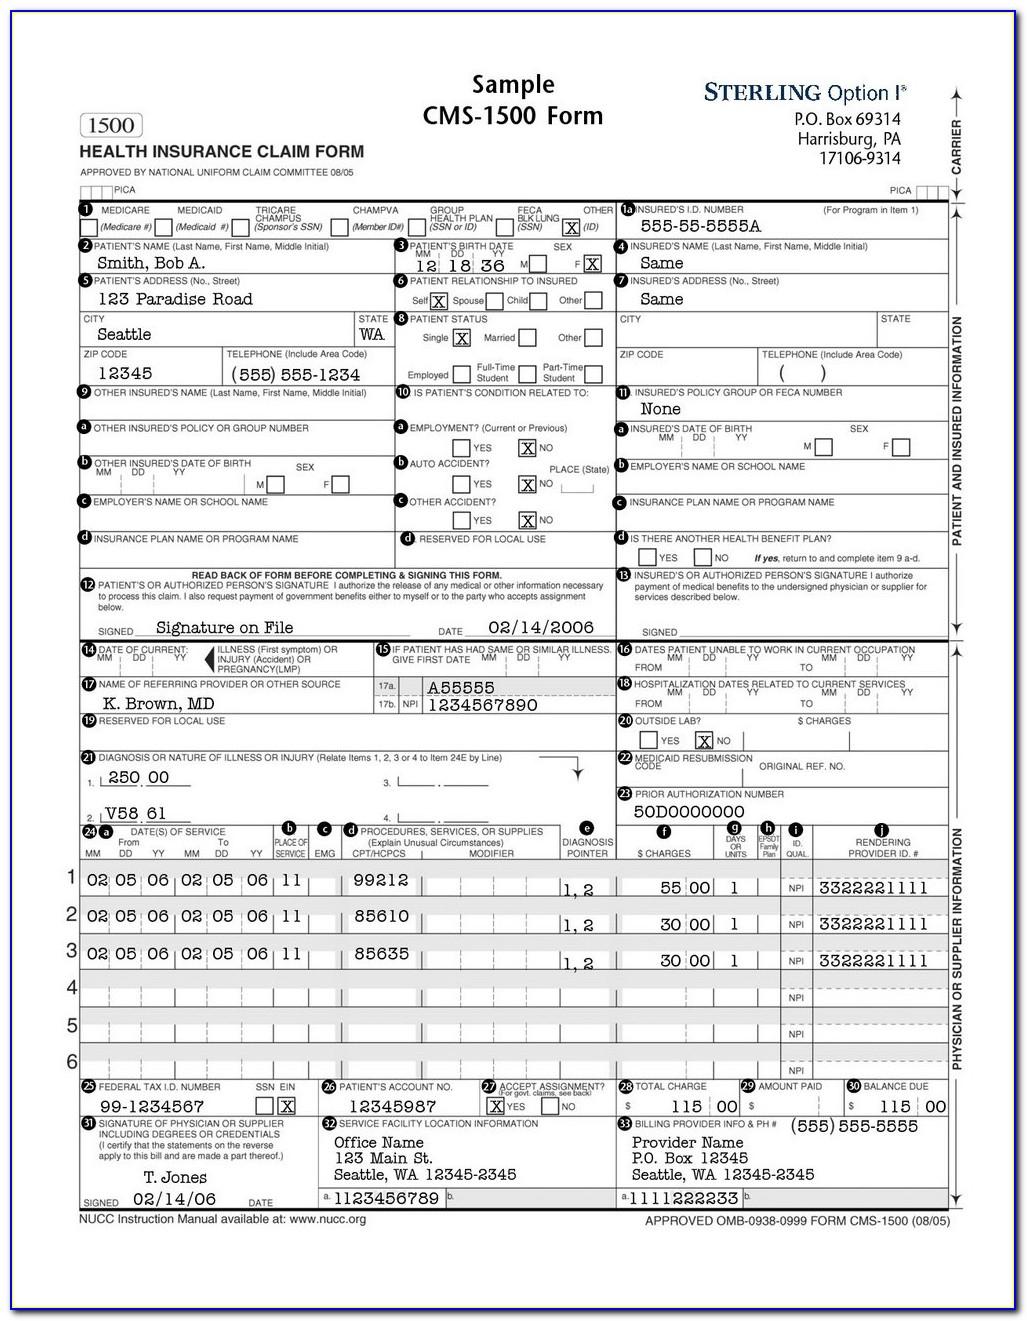 Hcfa 1500 Form Free Download